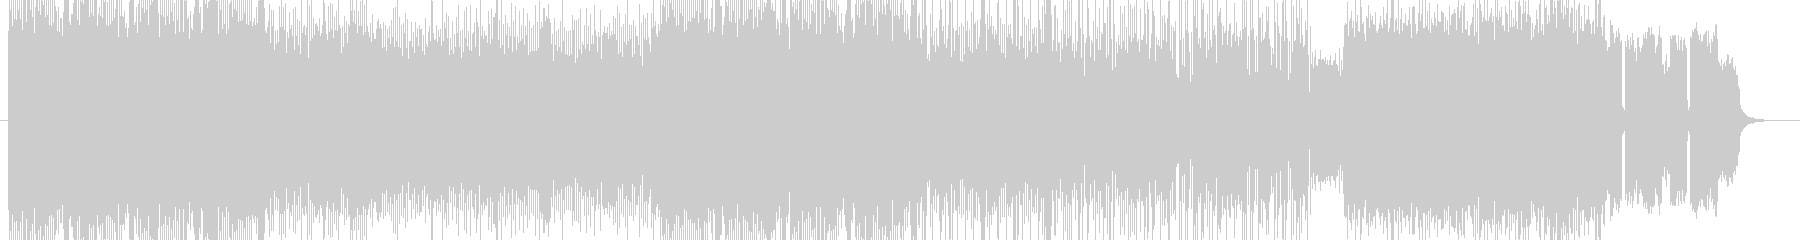 DEATH・HEAVYMETAL系の作曲の未再生の波形